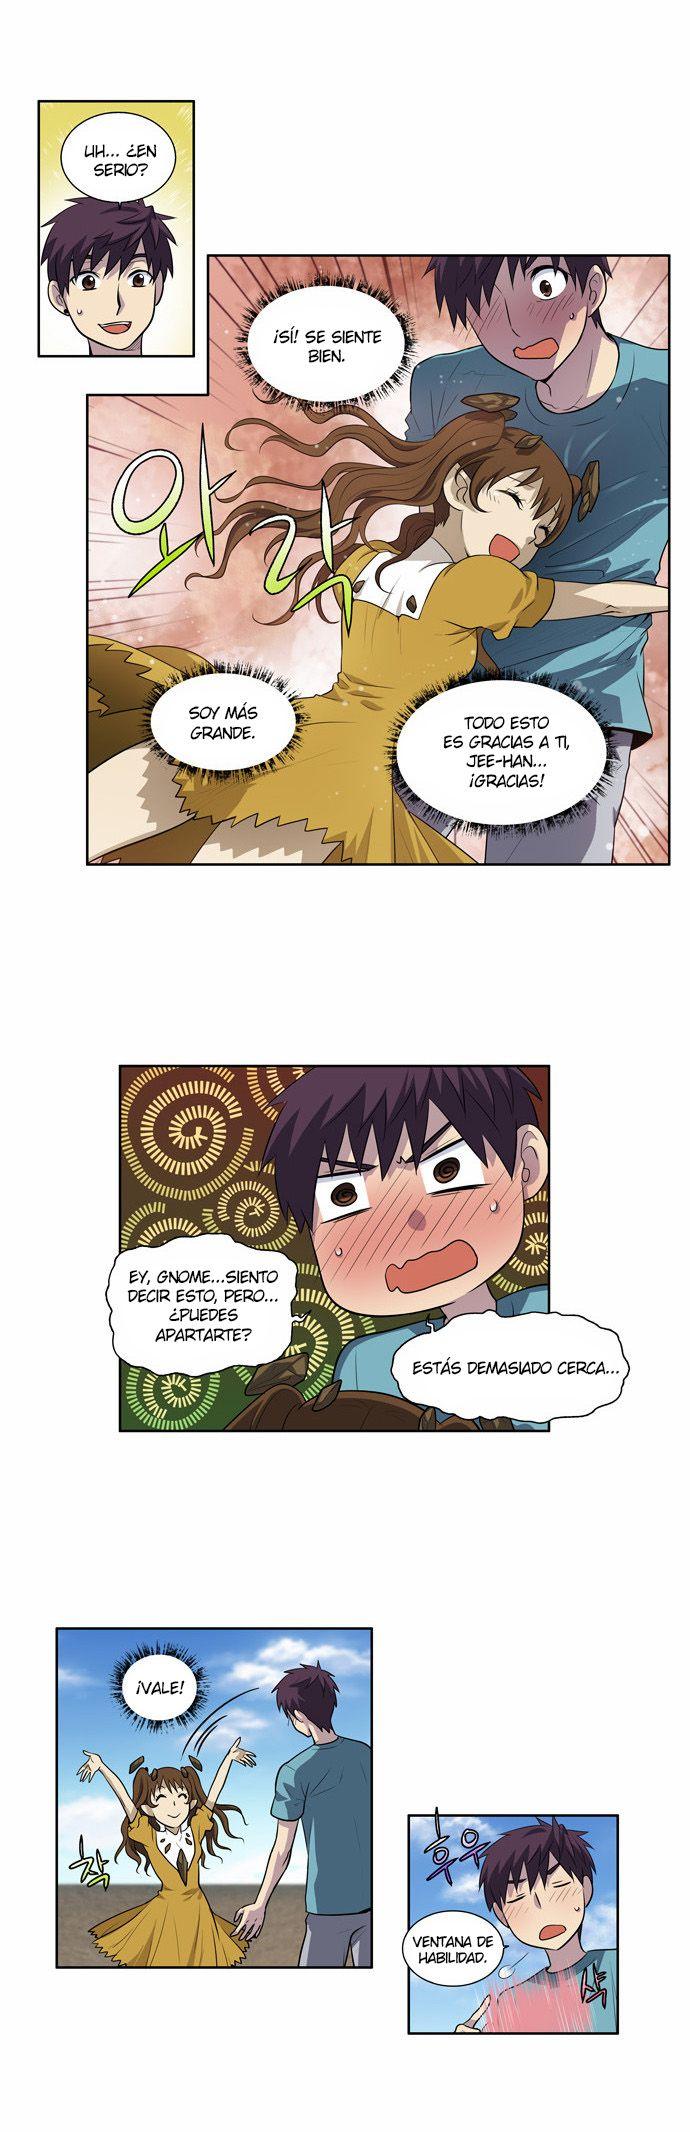 https://c5.ninemanga.com/es_manga/61/1725/464476/4c08fffb3398da3be15b0a6f49983bd0.jpg Page 4